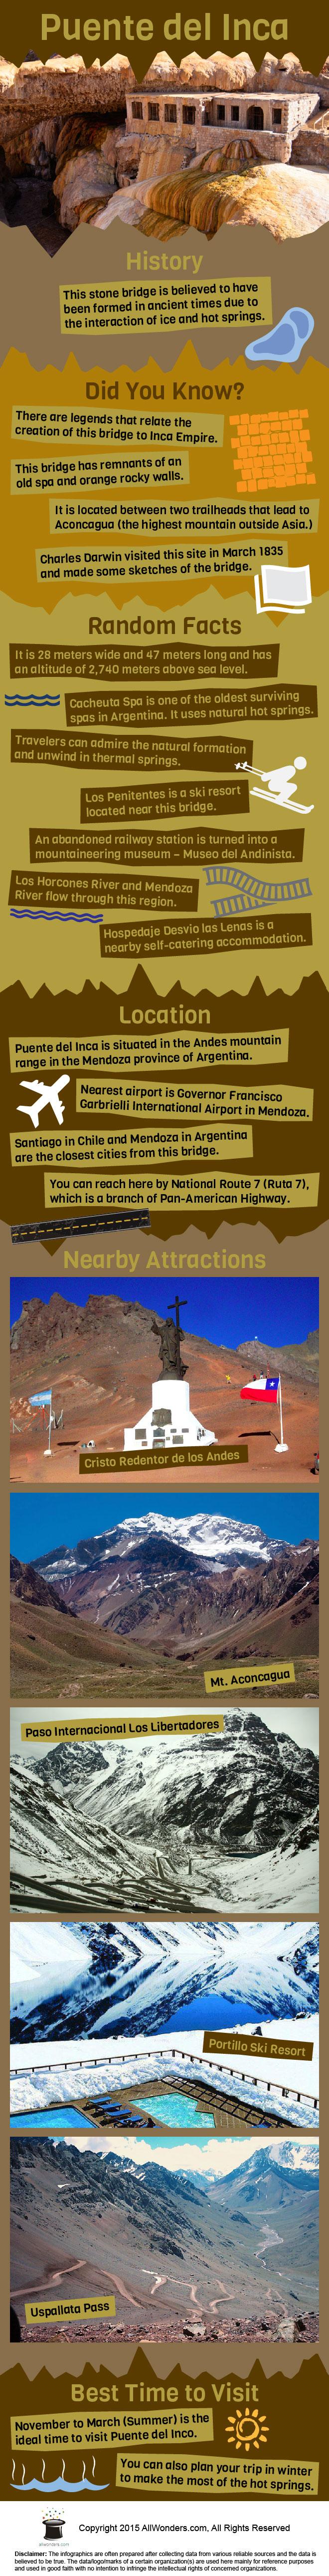 Puente Del Inca Infographic